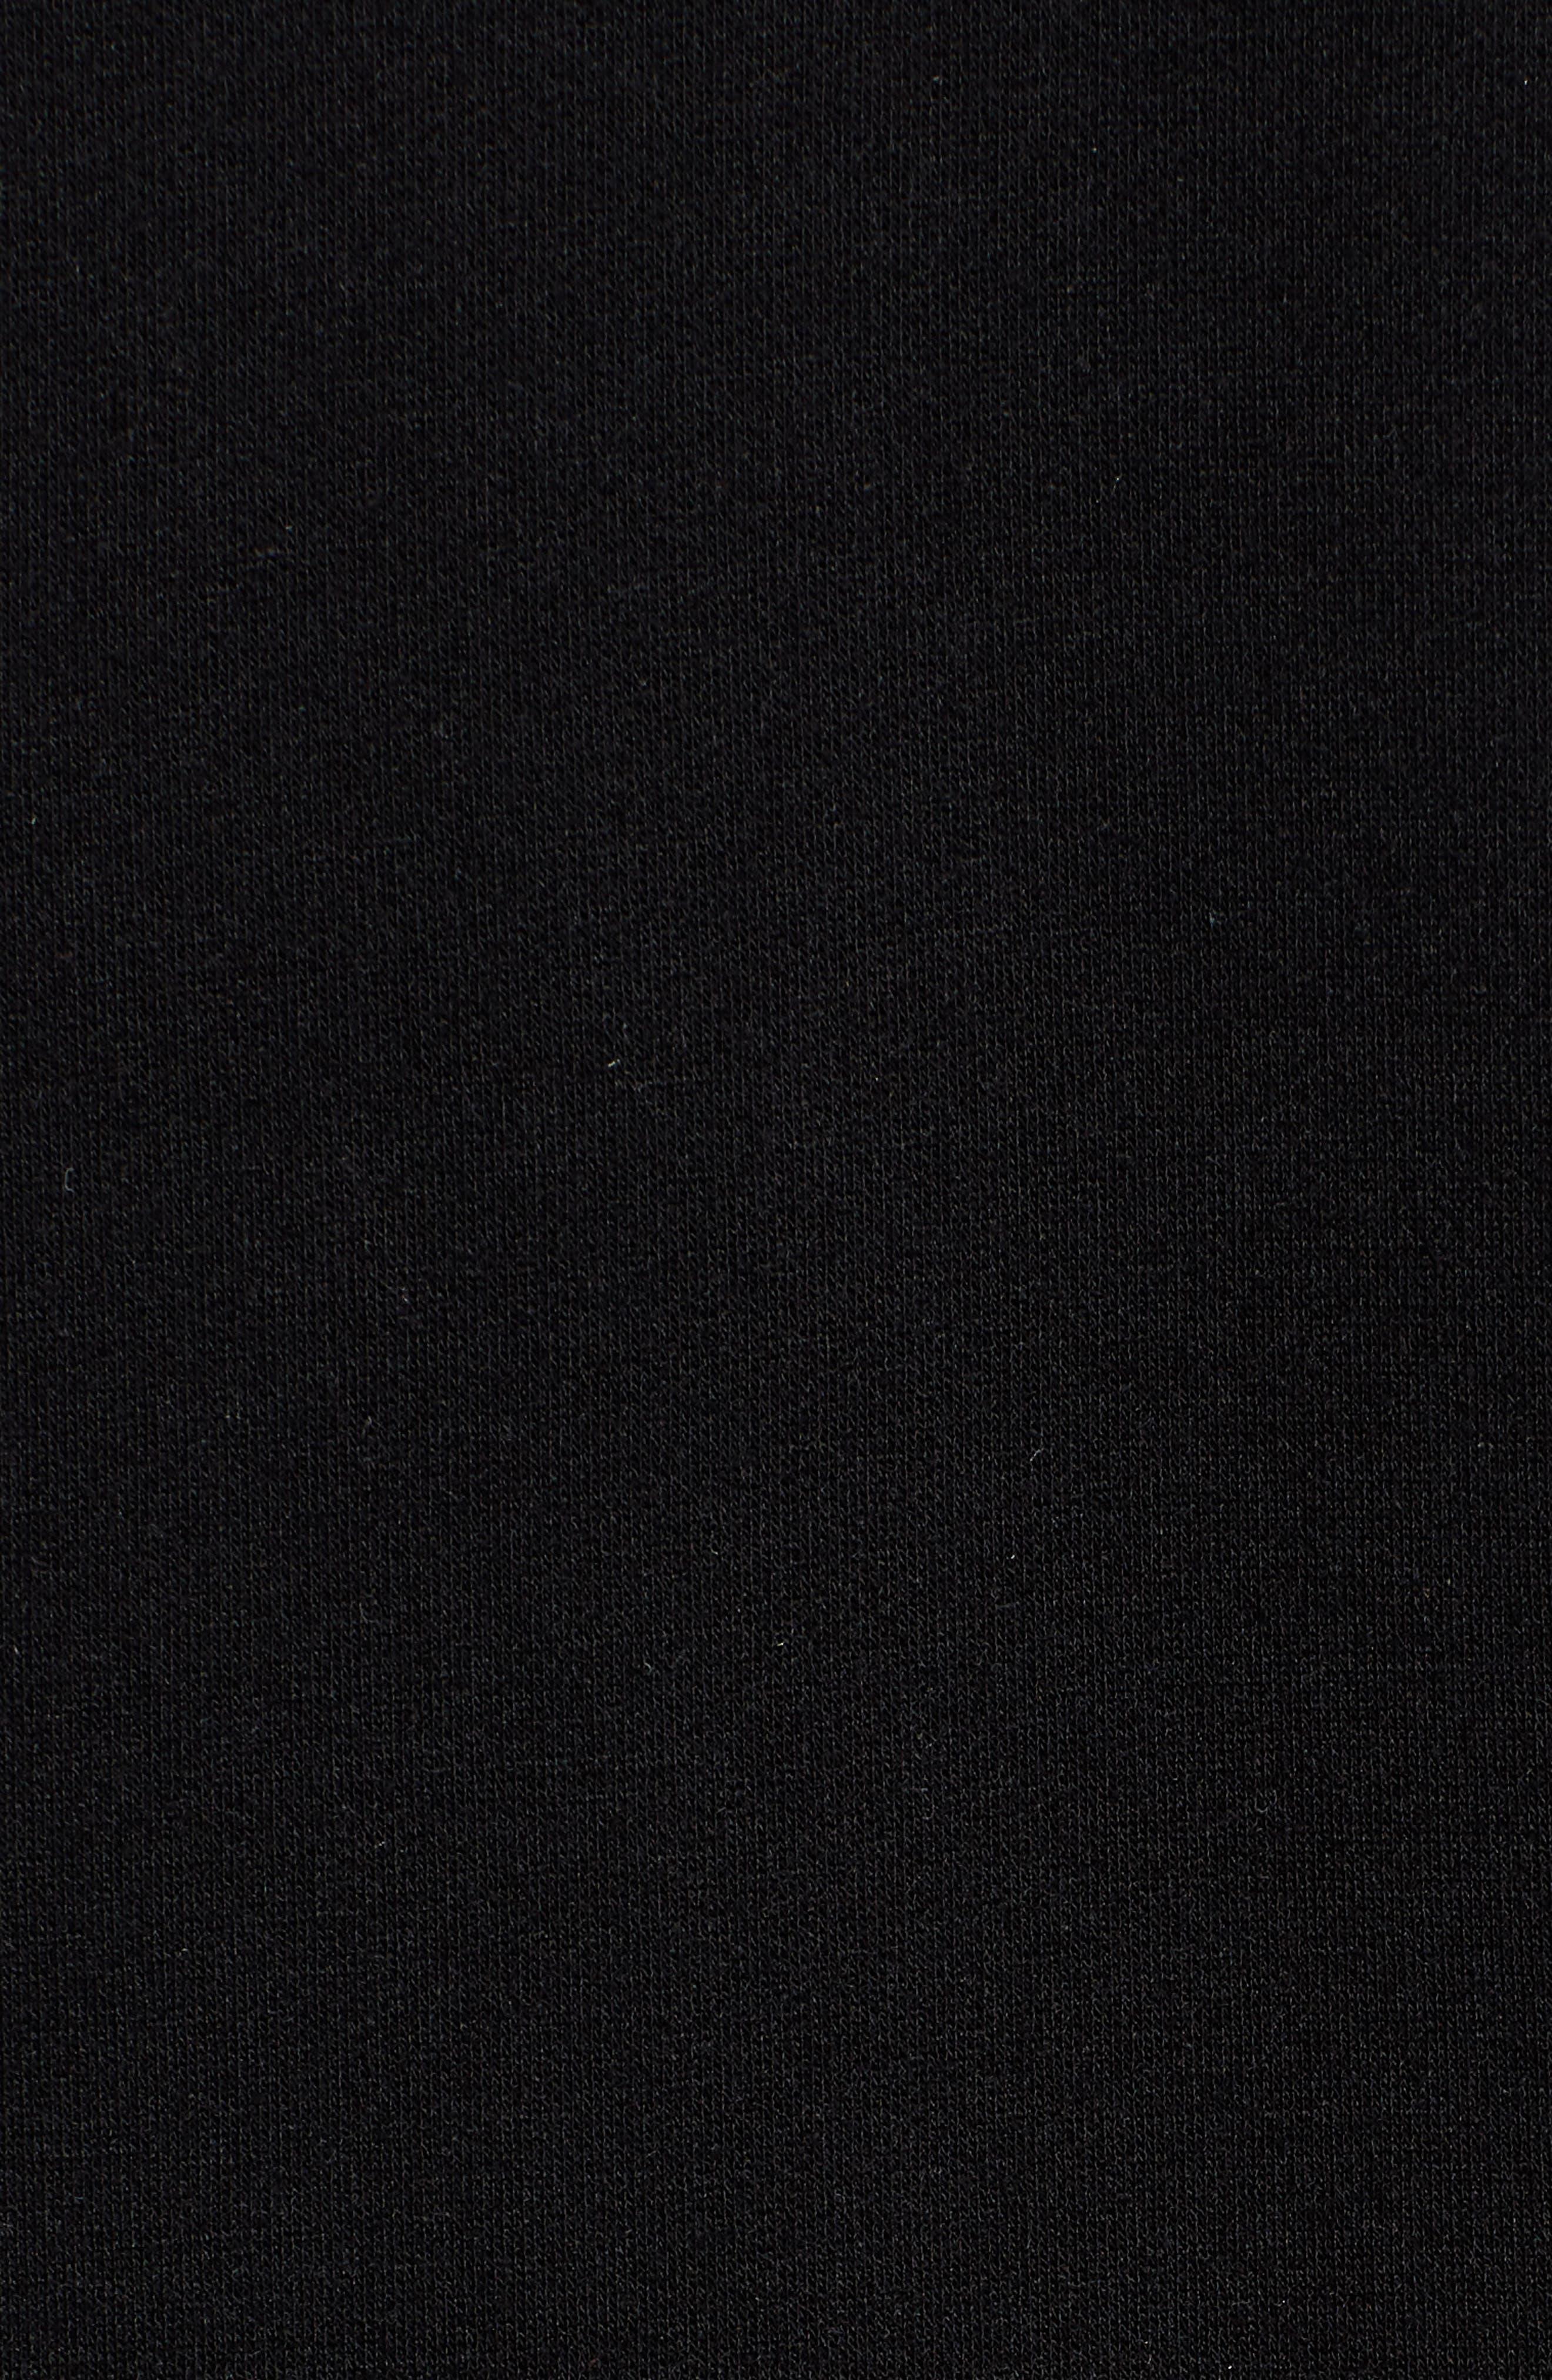 Off-Duty Fleece Knit Cardigan,                             Alternate thumbnail 5, color,                             001